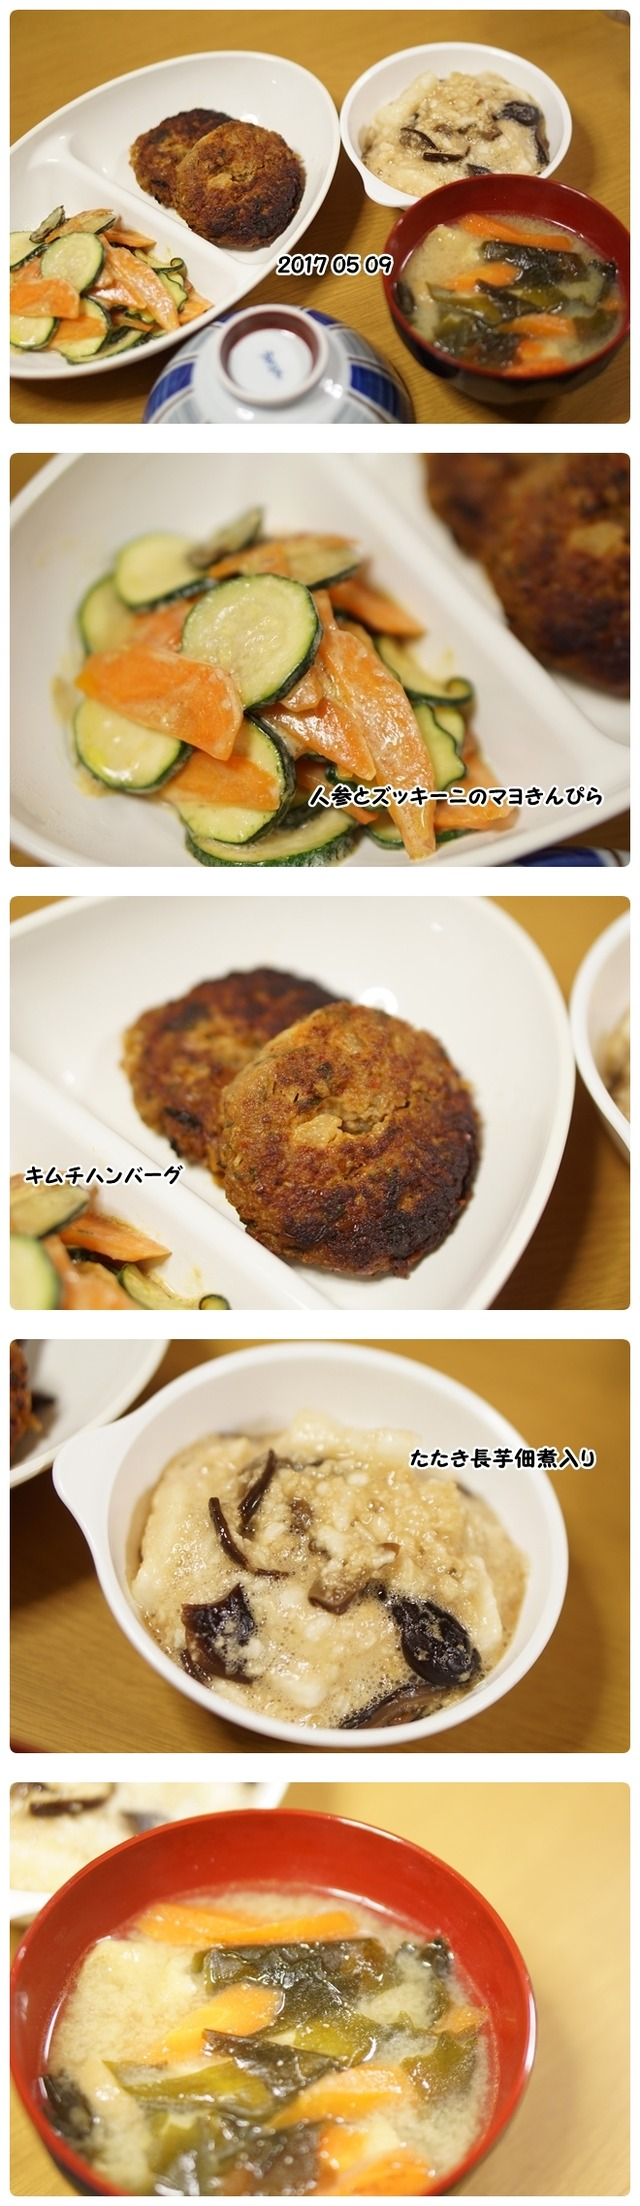 ■DSC01577-vert